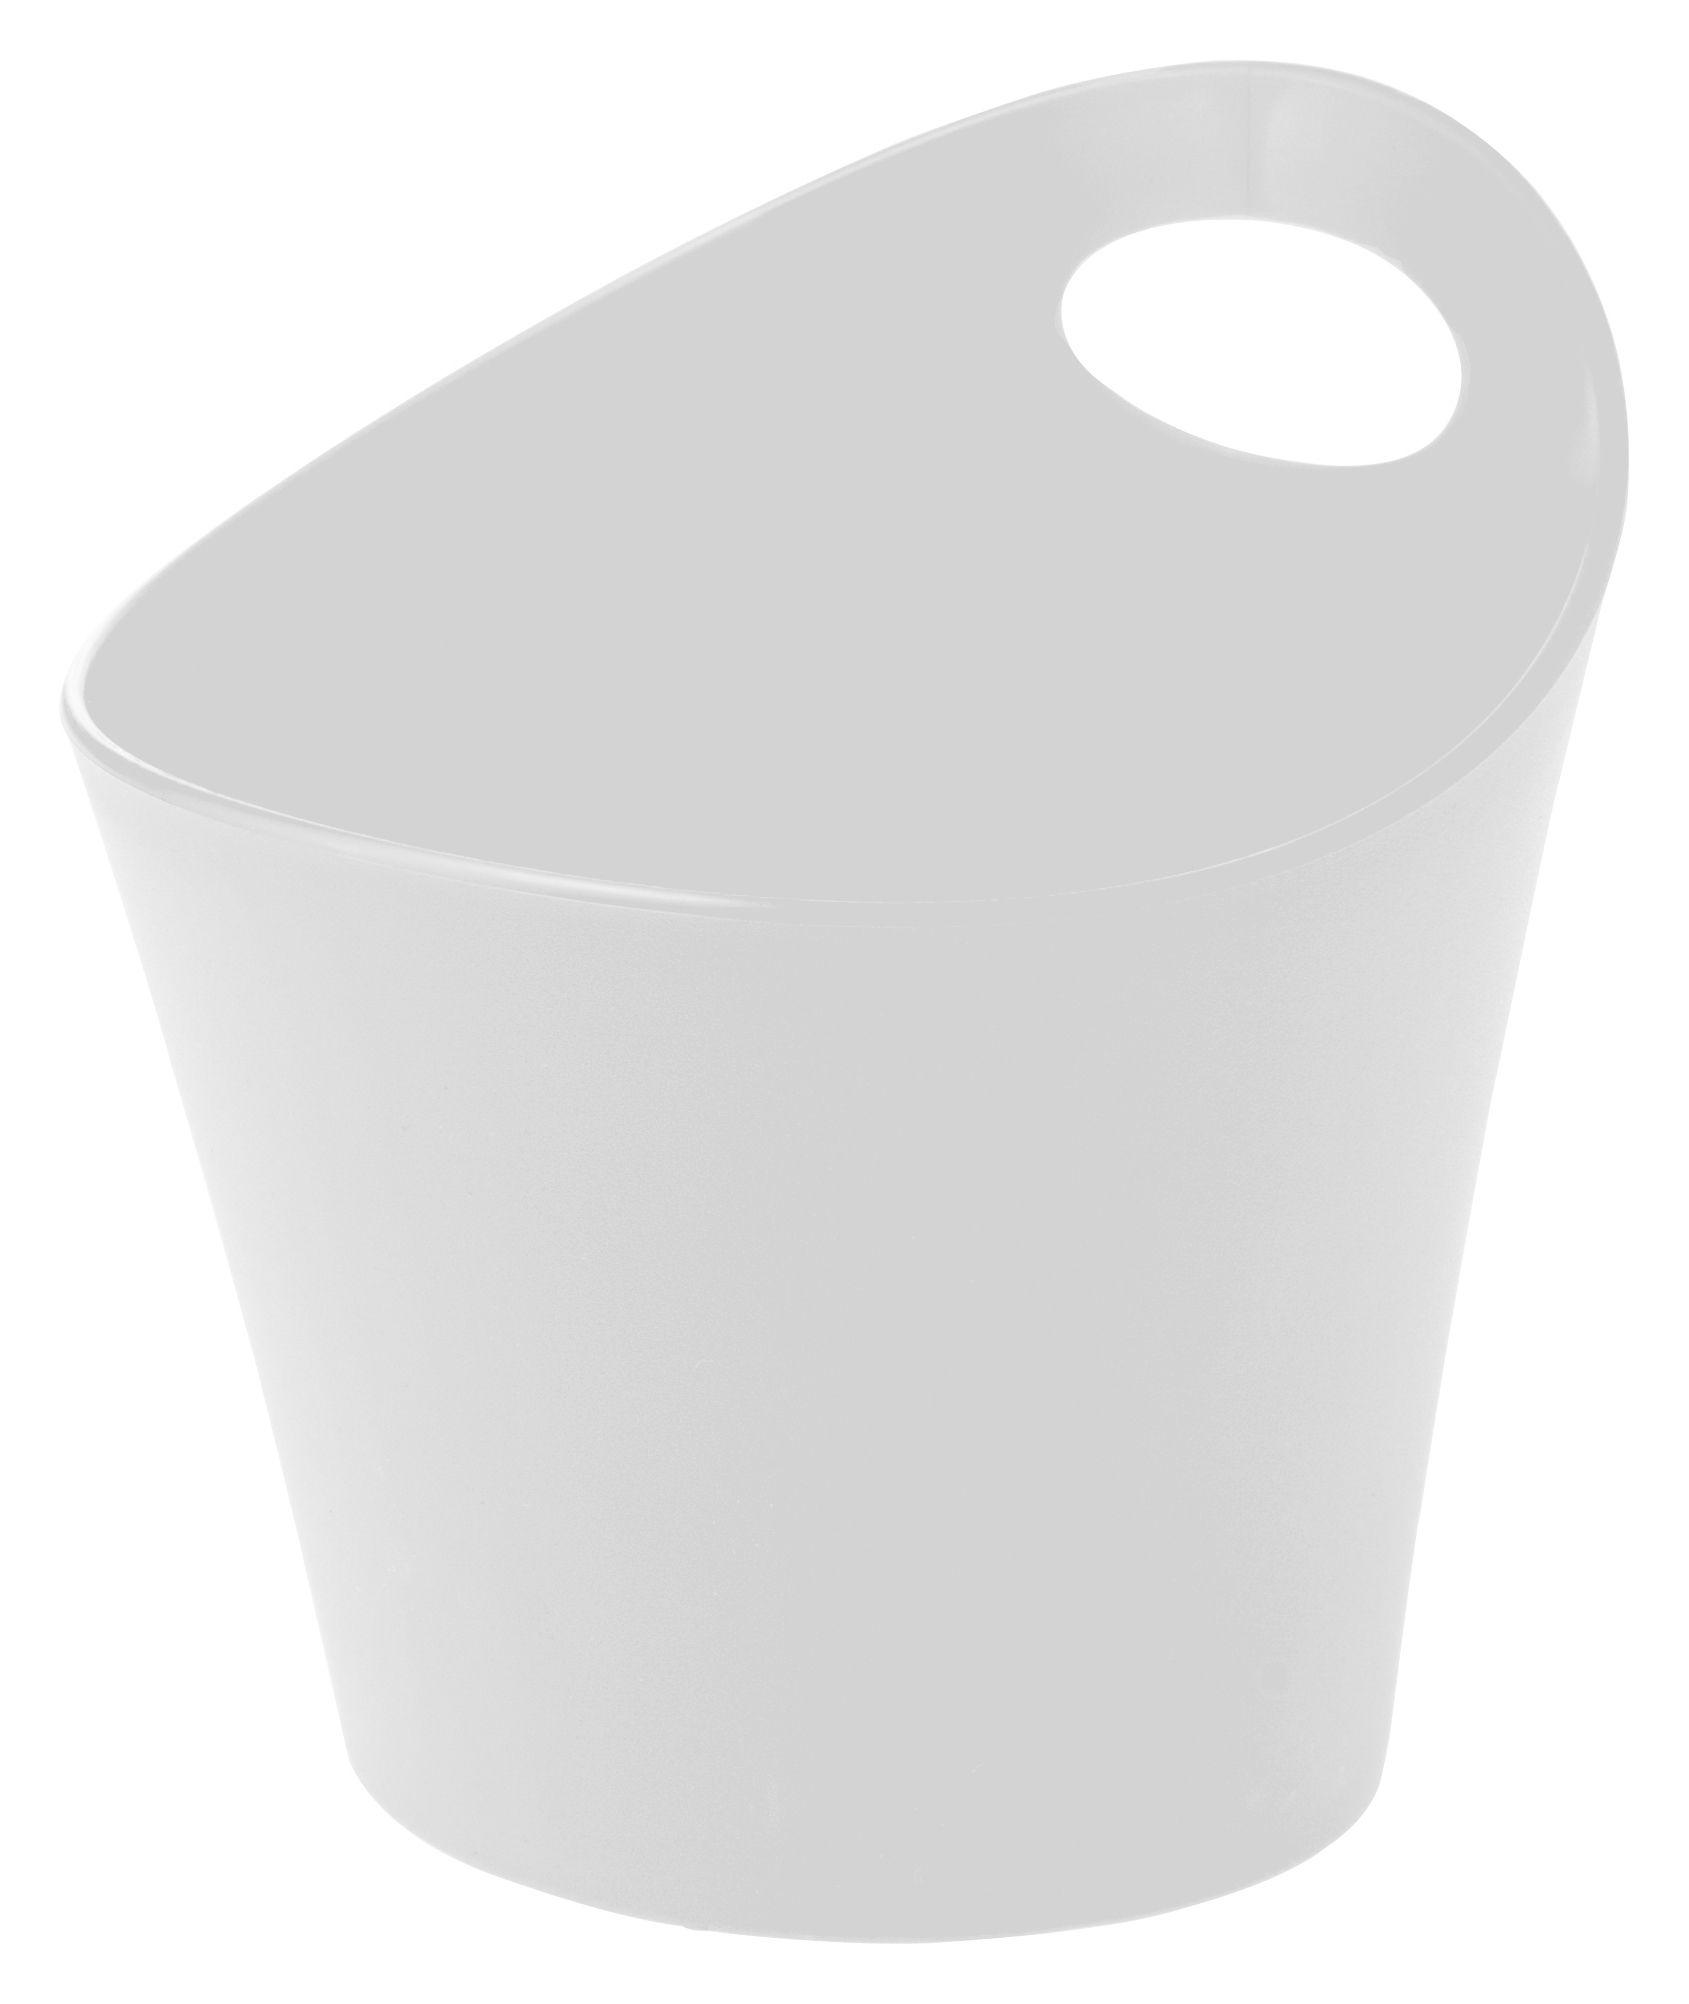 Decoration - For bathroom - Pottichelli XS Pot - Ø 15 x H 9 cm by Koziol - White - PMMA